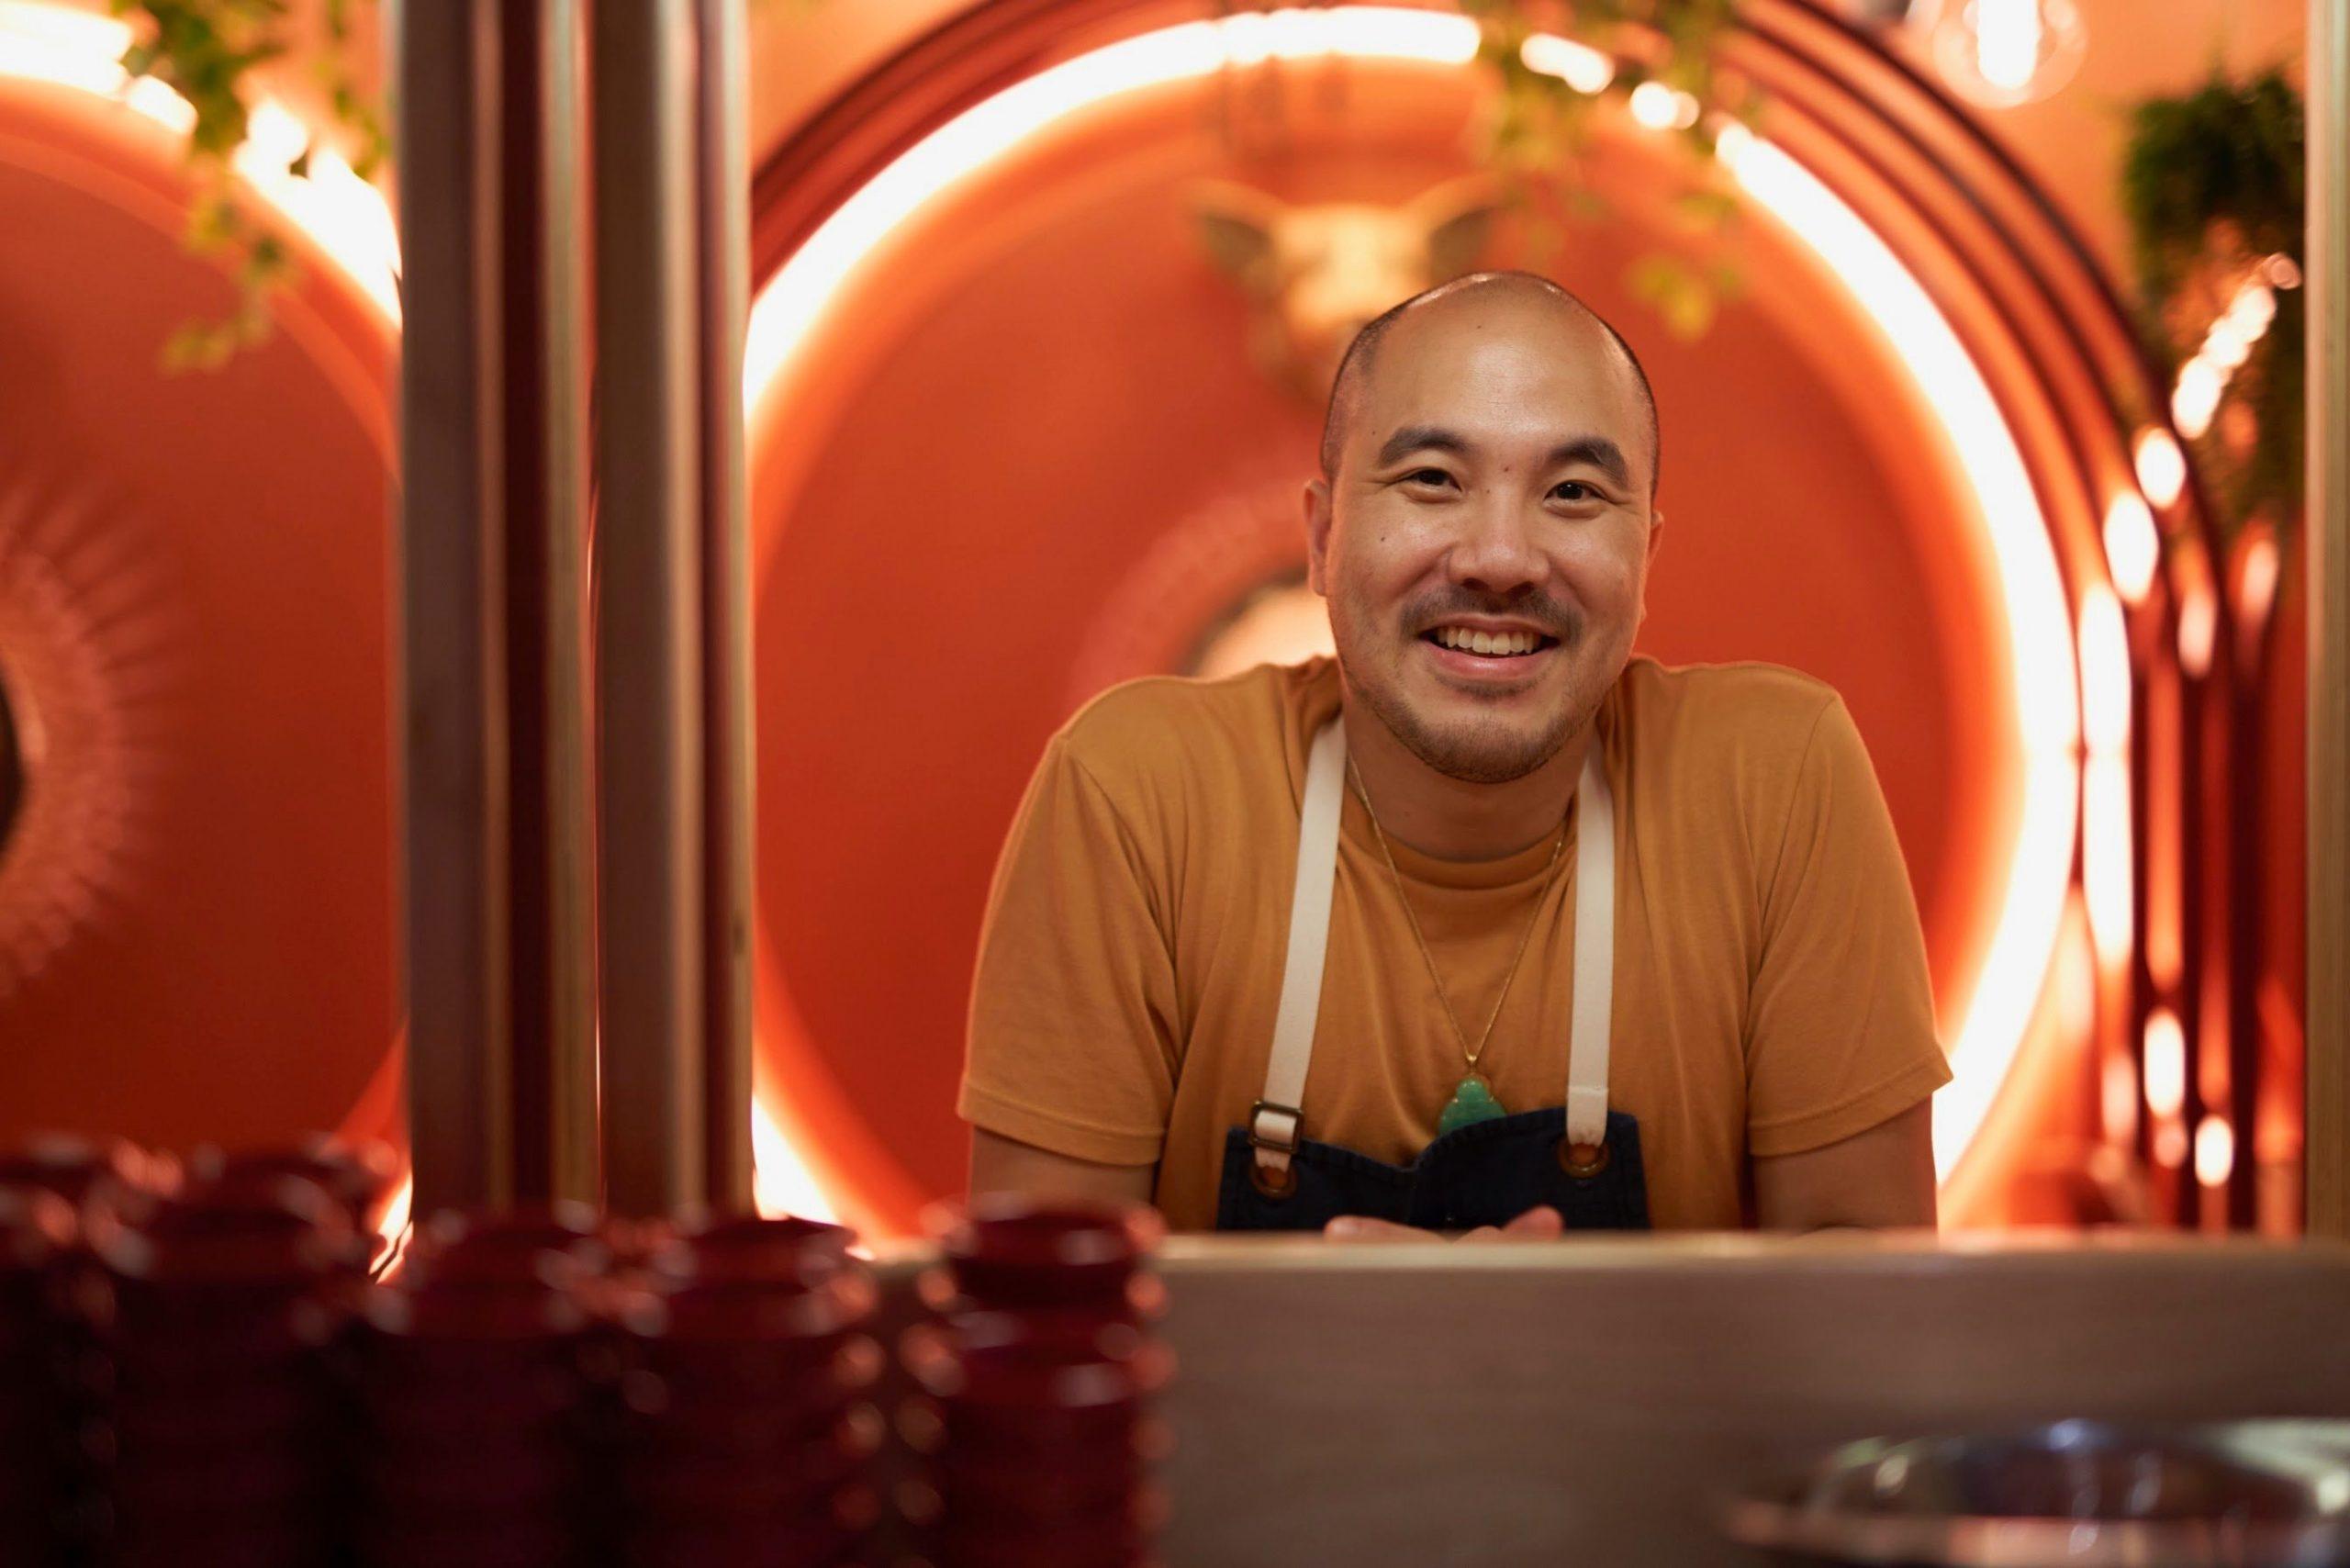 chef-owner Jon Nguyen